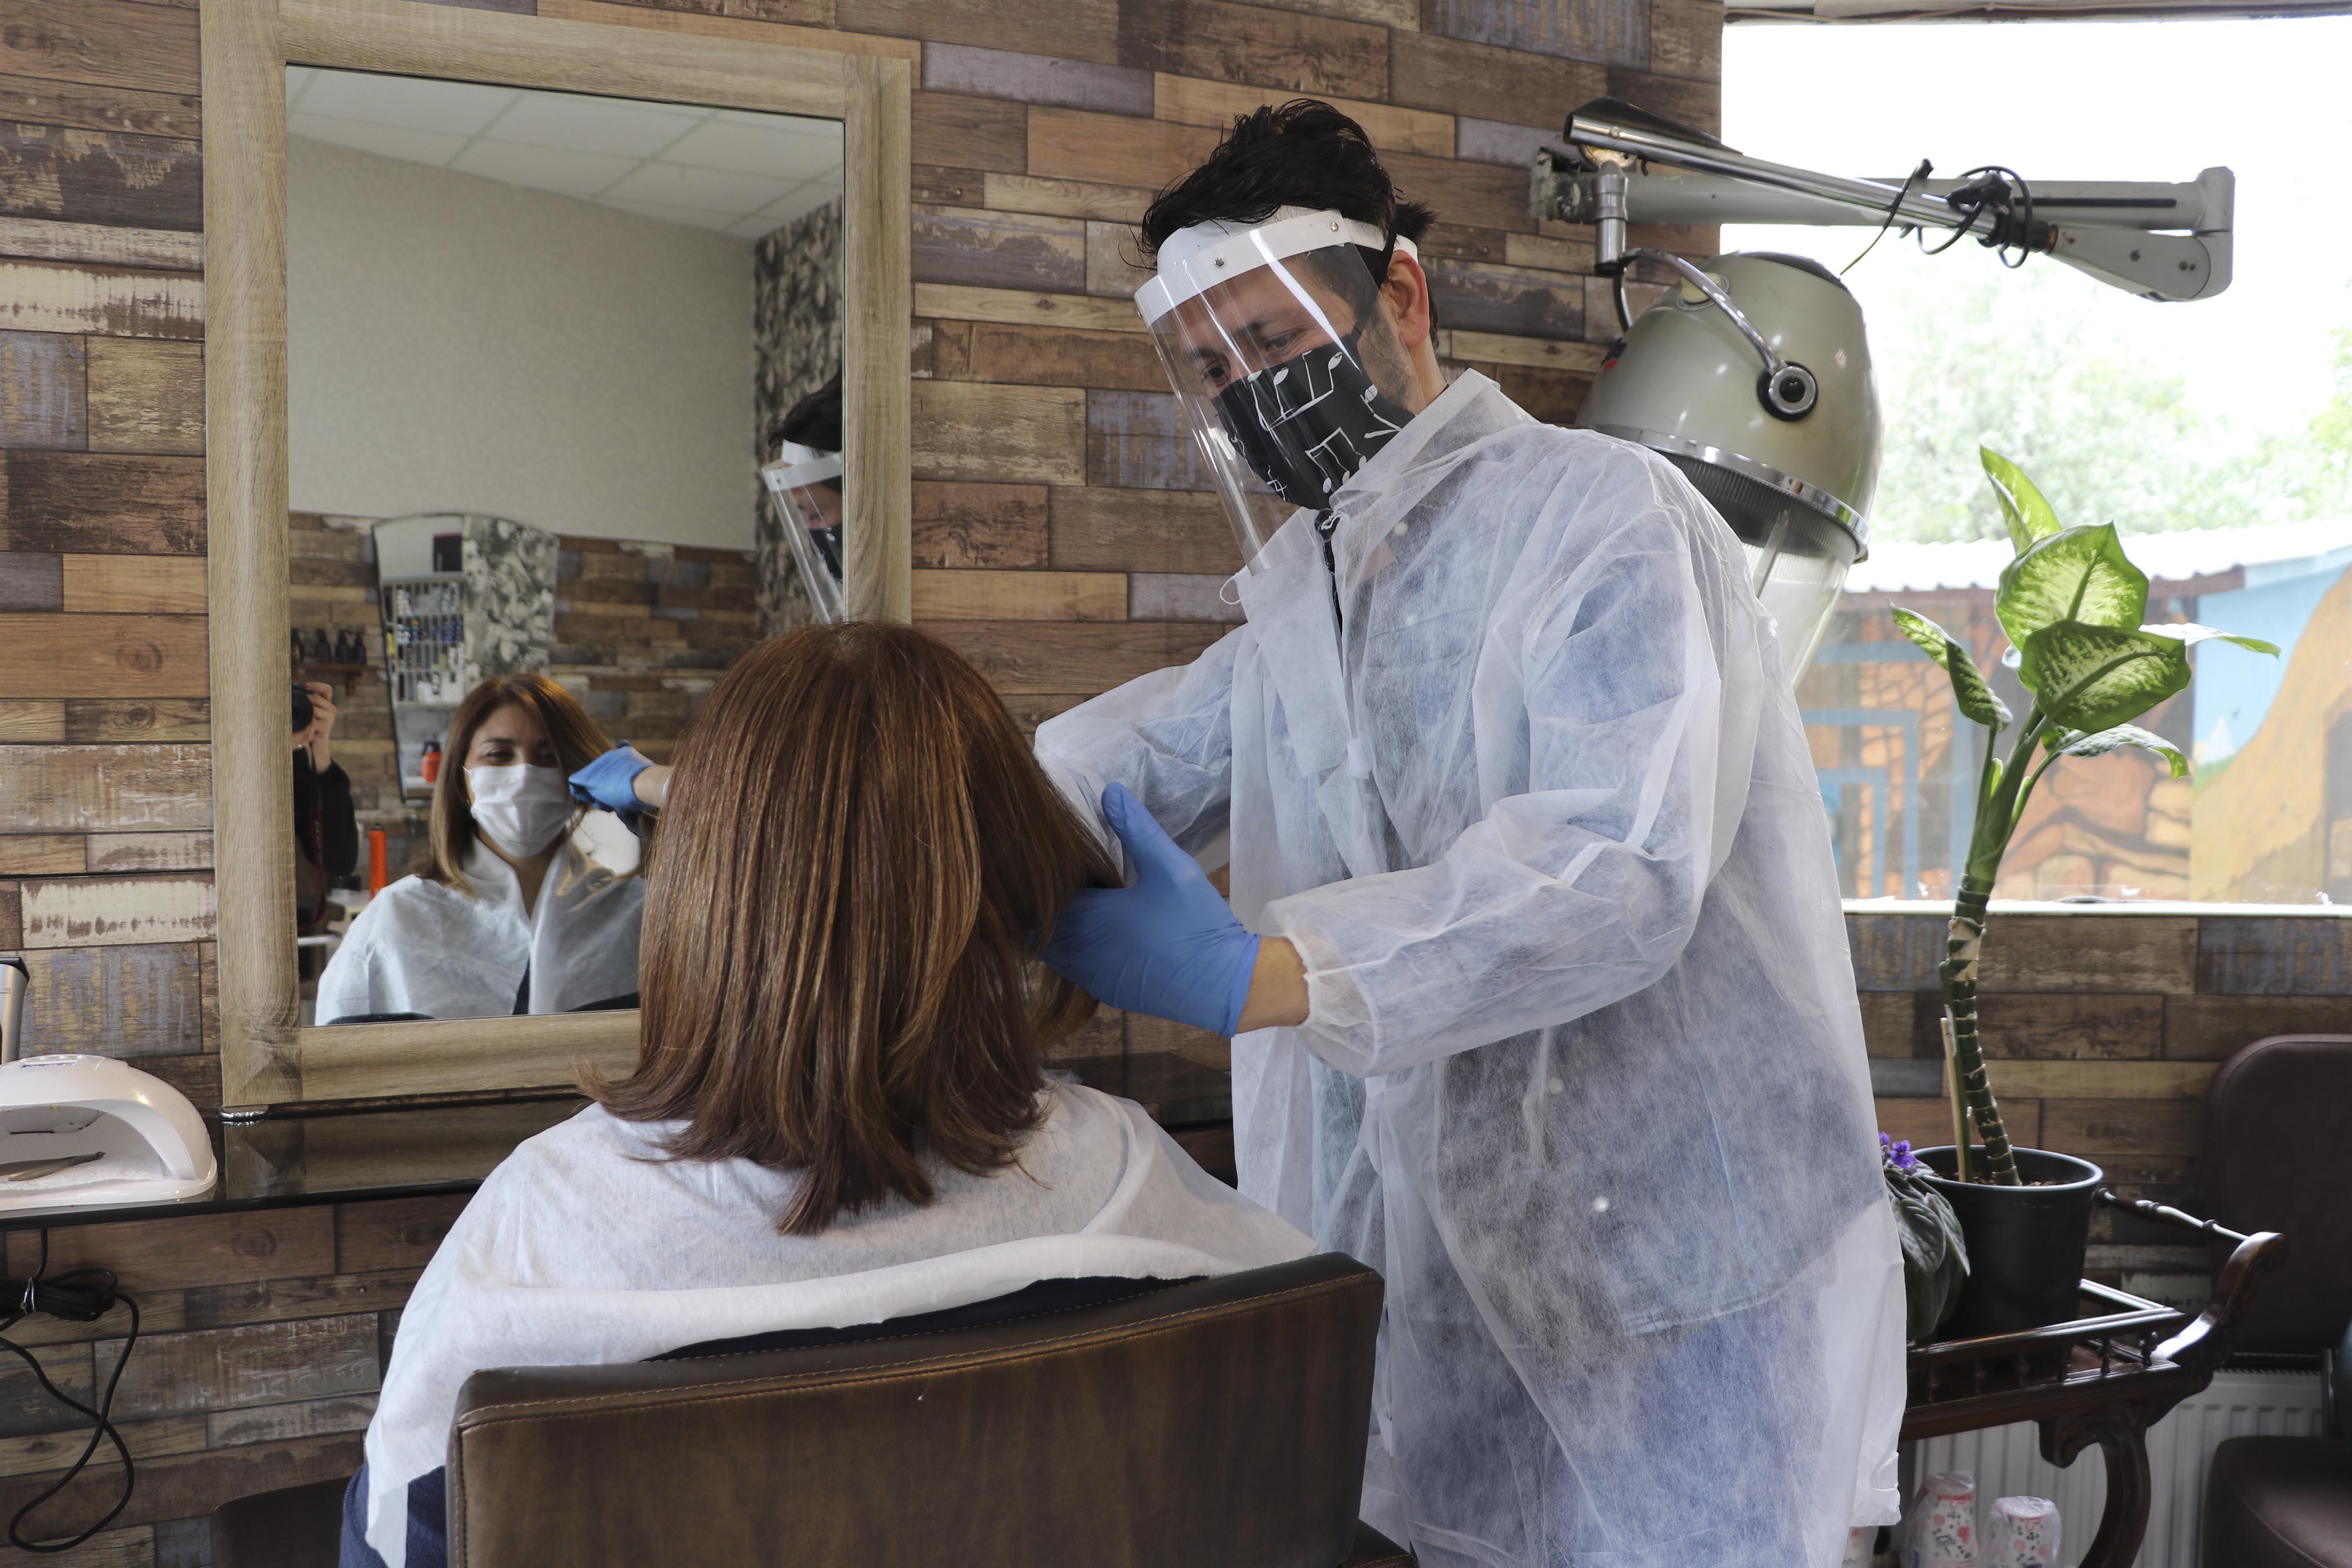 pandemi-surecinde-makyaj-yapan-ve-yaptiran-kisi-icin-riskli-3070-dhaphoto3.jpg